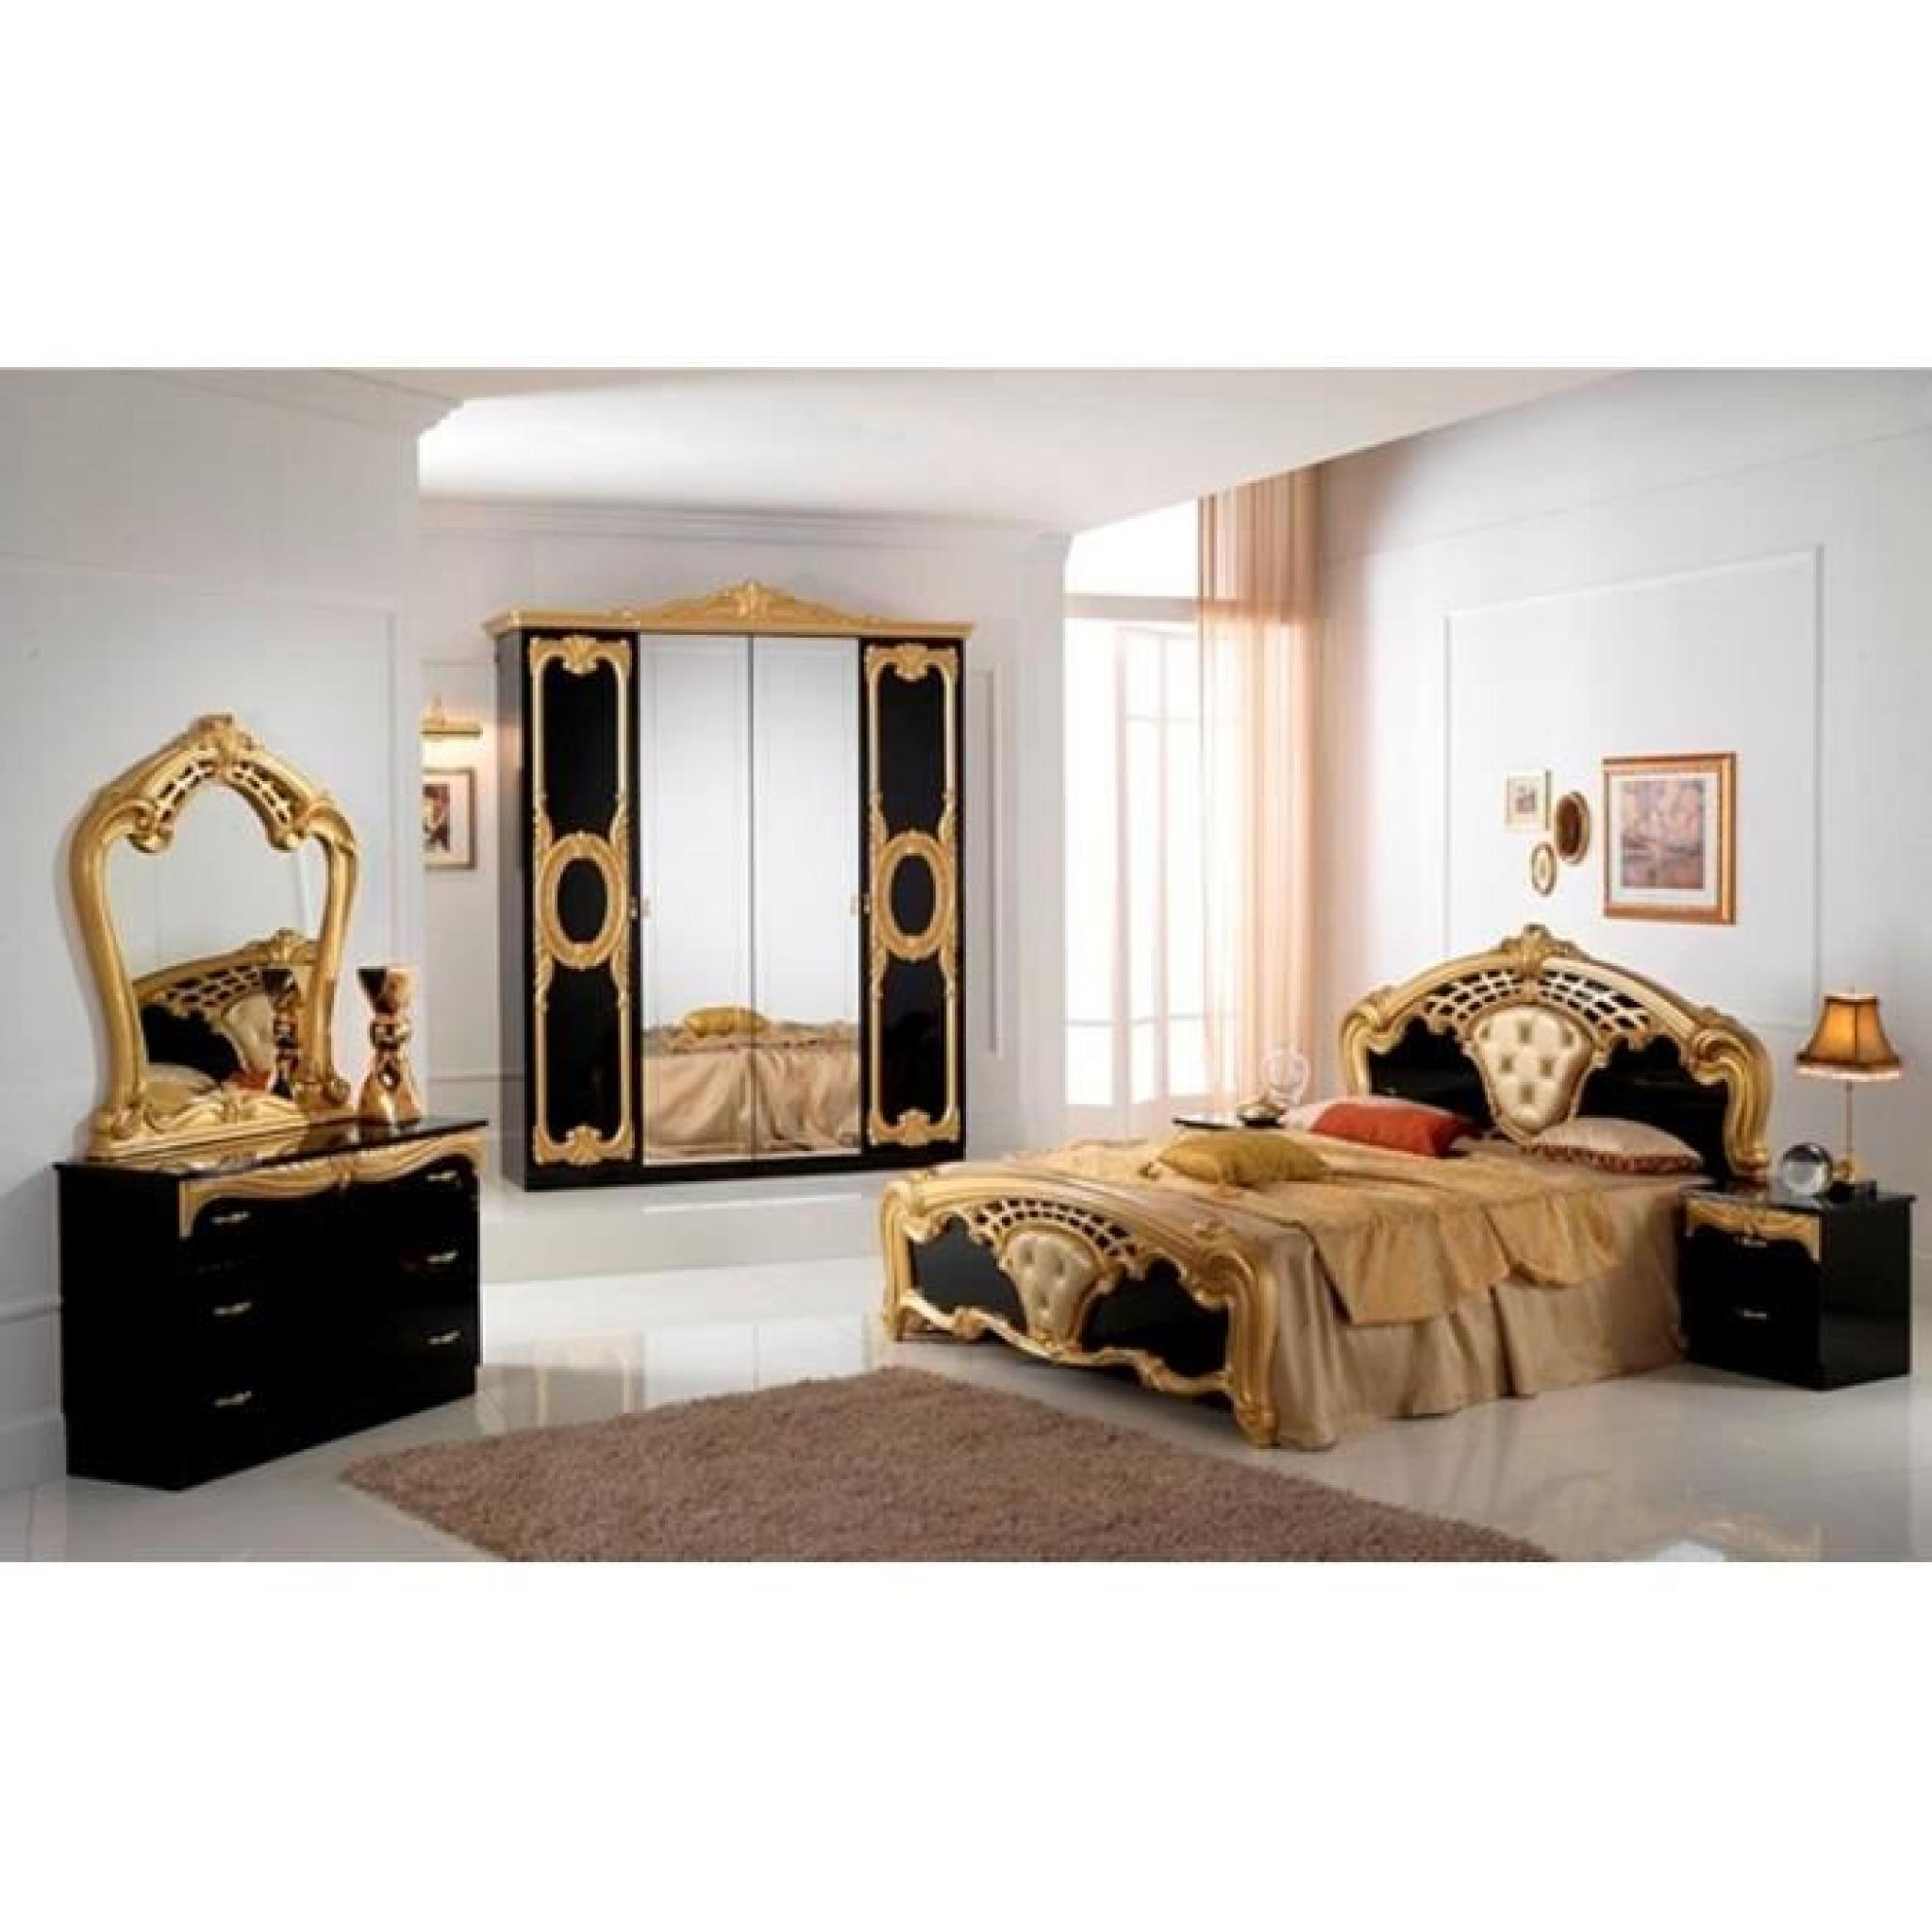 Chambre a coucher complete modele cristina noir brillant for Achat chambre complete